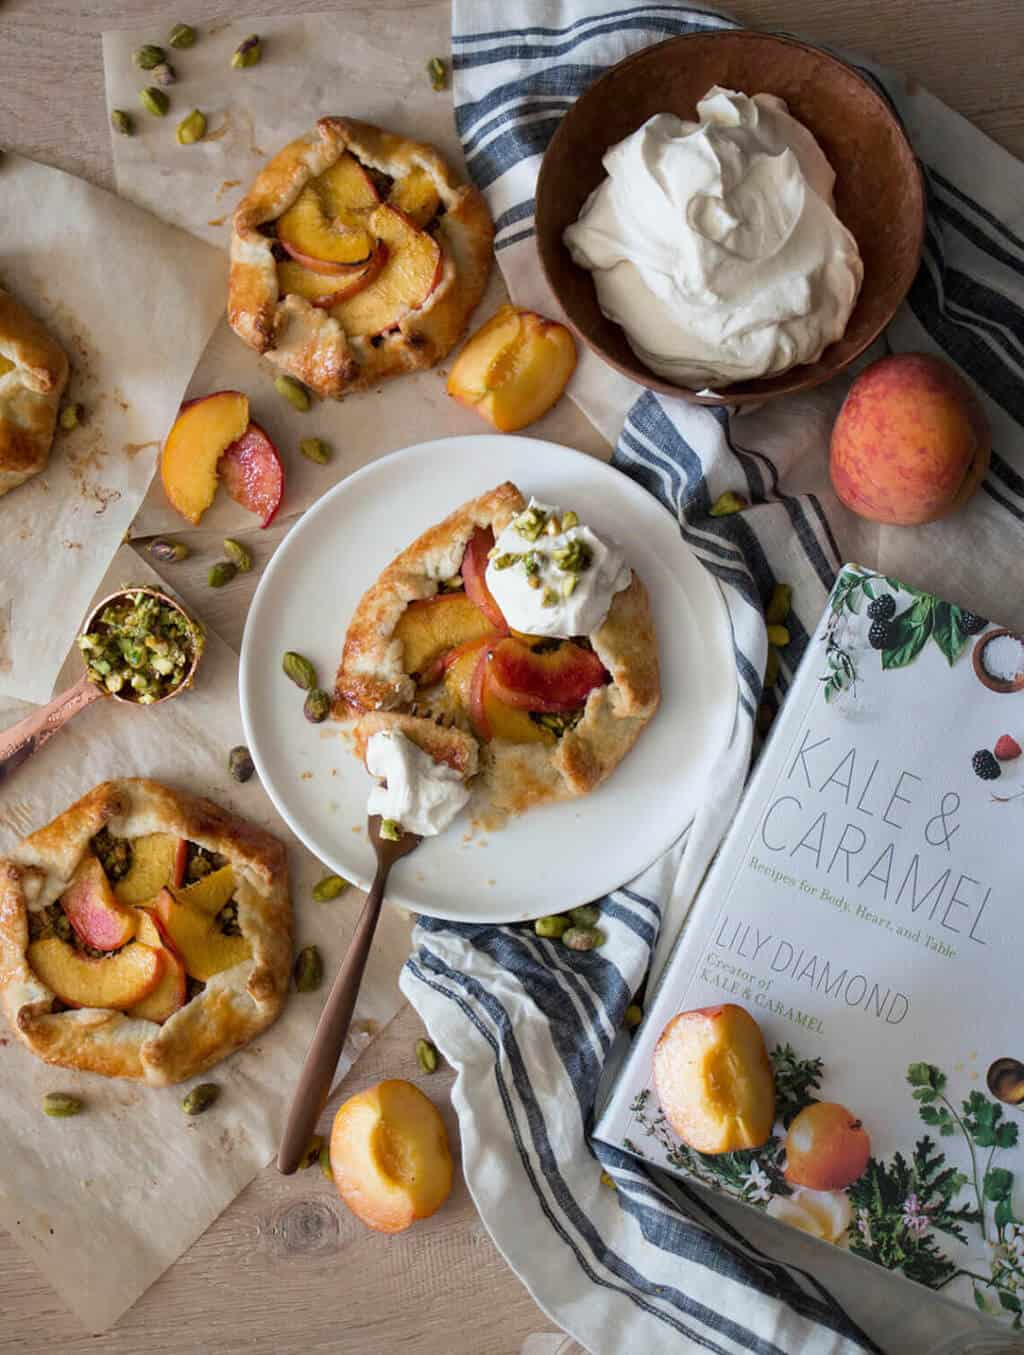 A Peach & Pistachio Galette on a plate.